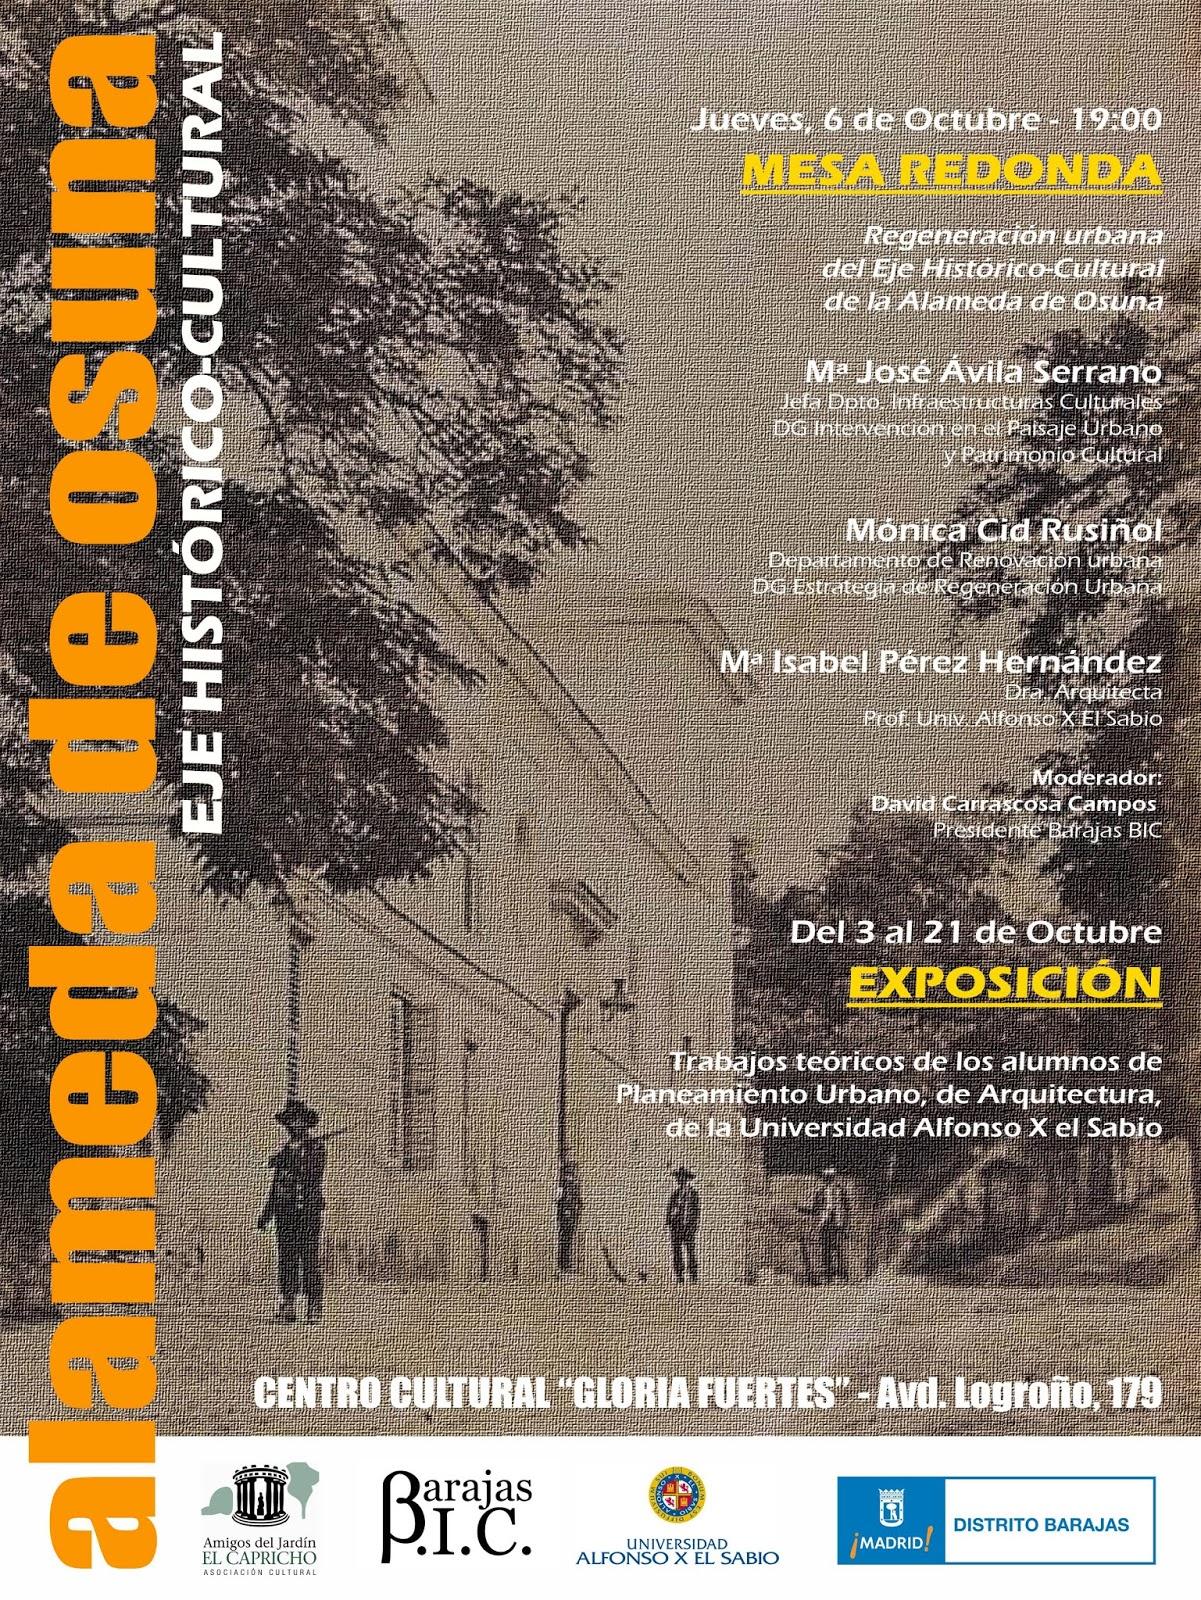 Barajas bic eje hist rico cultural de la alameda de osuna for Jardin historico el capricho paseo alameda de osuna 25